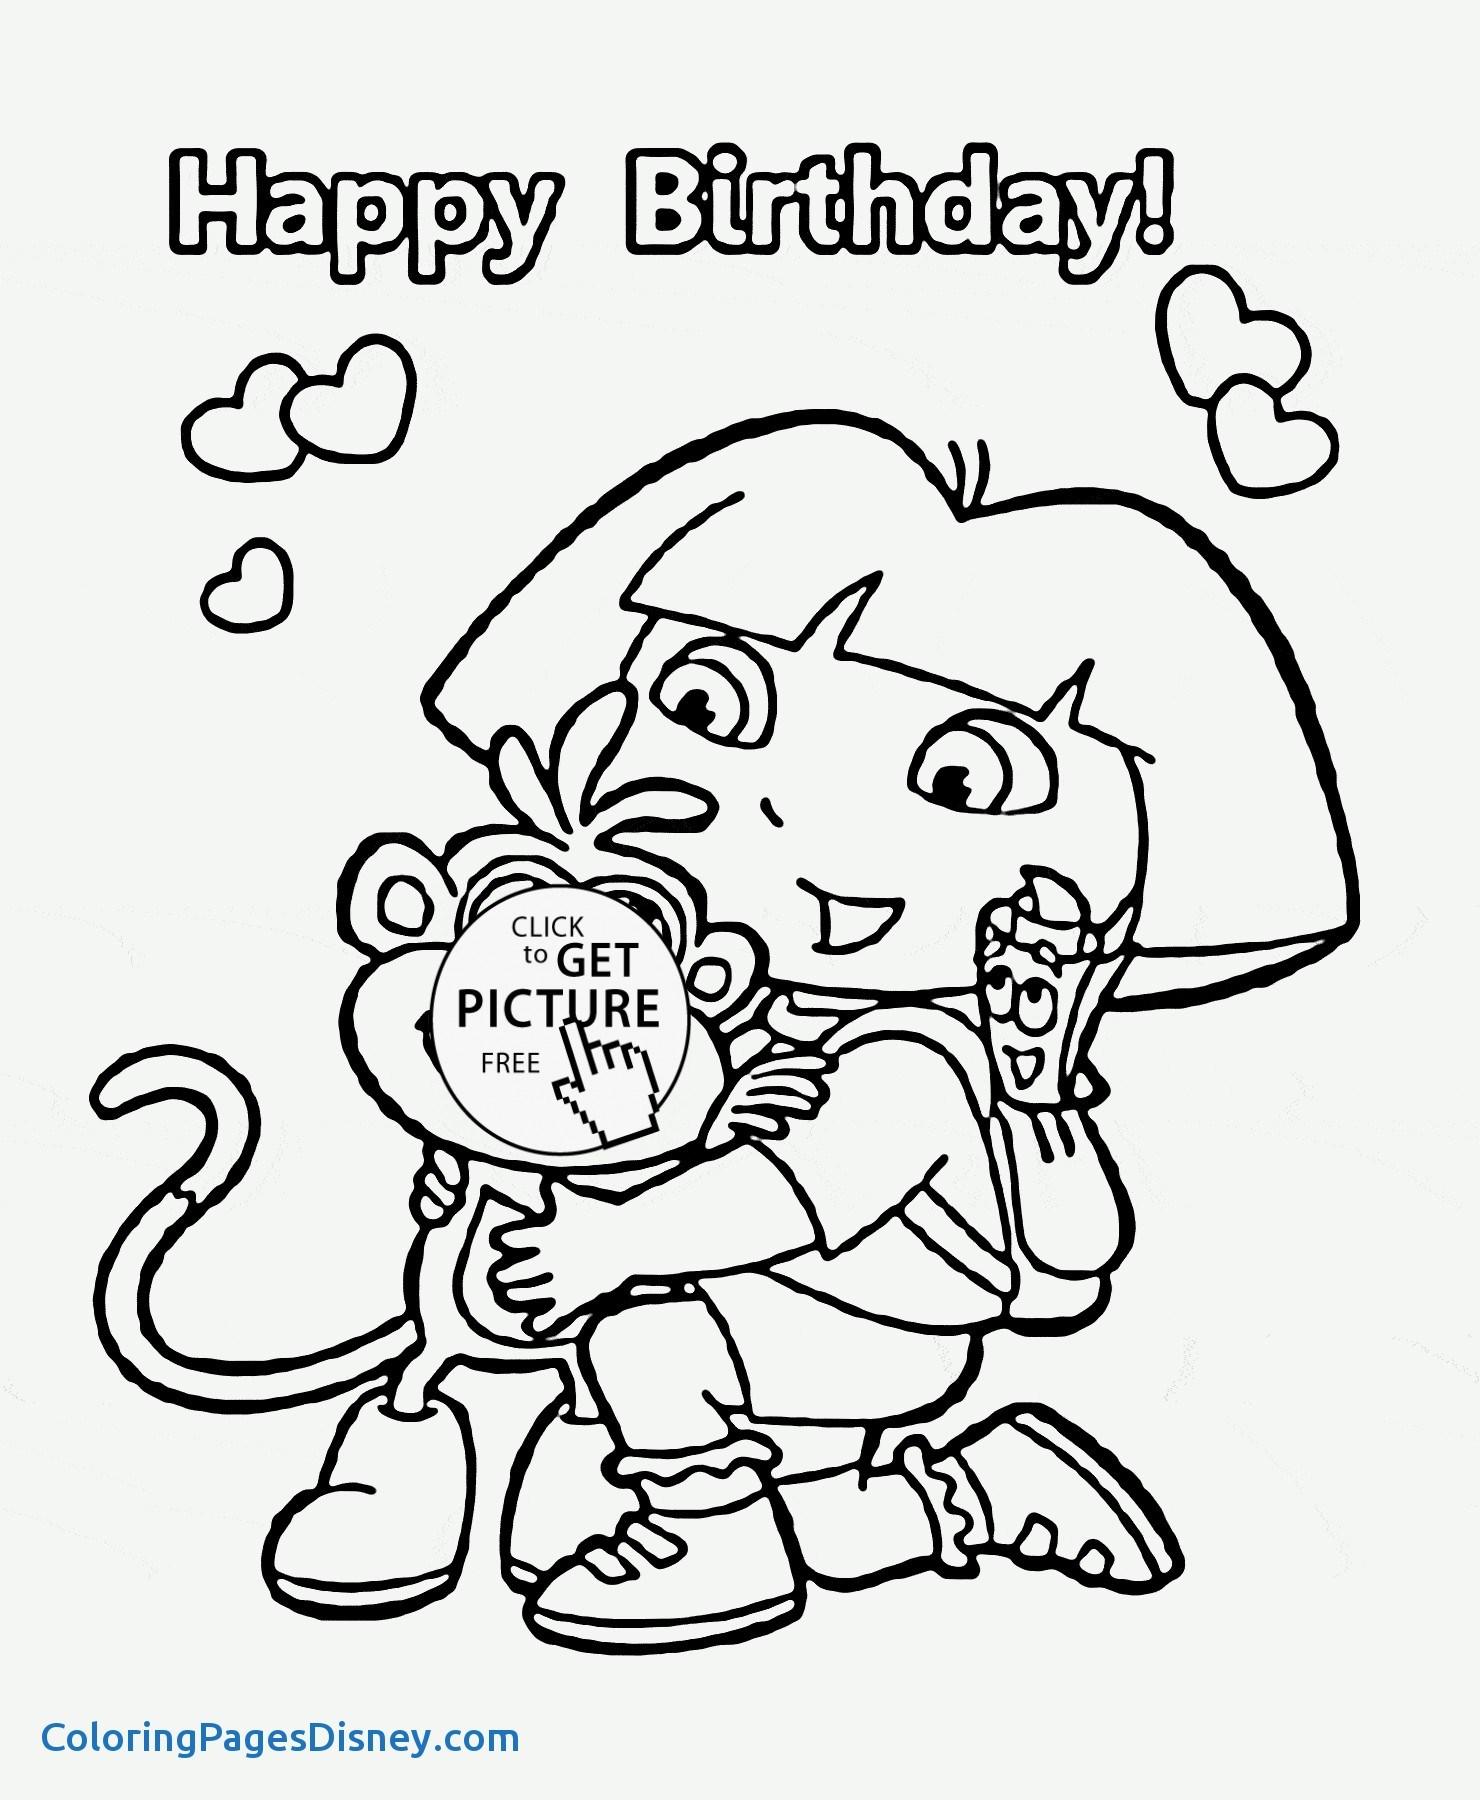 1480x1800 Go, Diego, Go! Coloring Pages New Dora Cartoon Happy Birthday